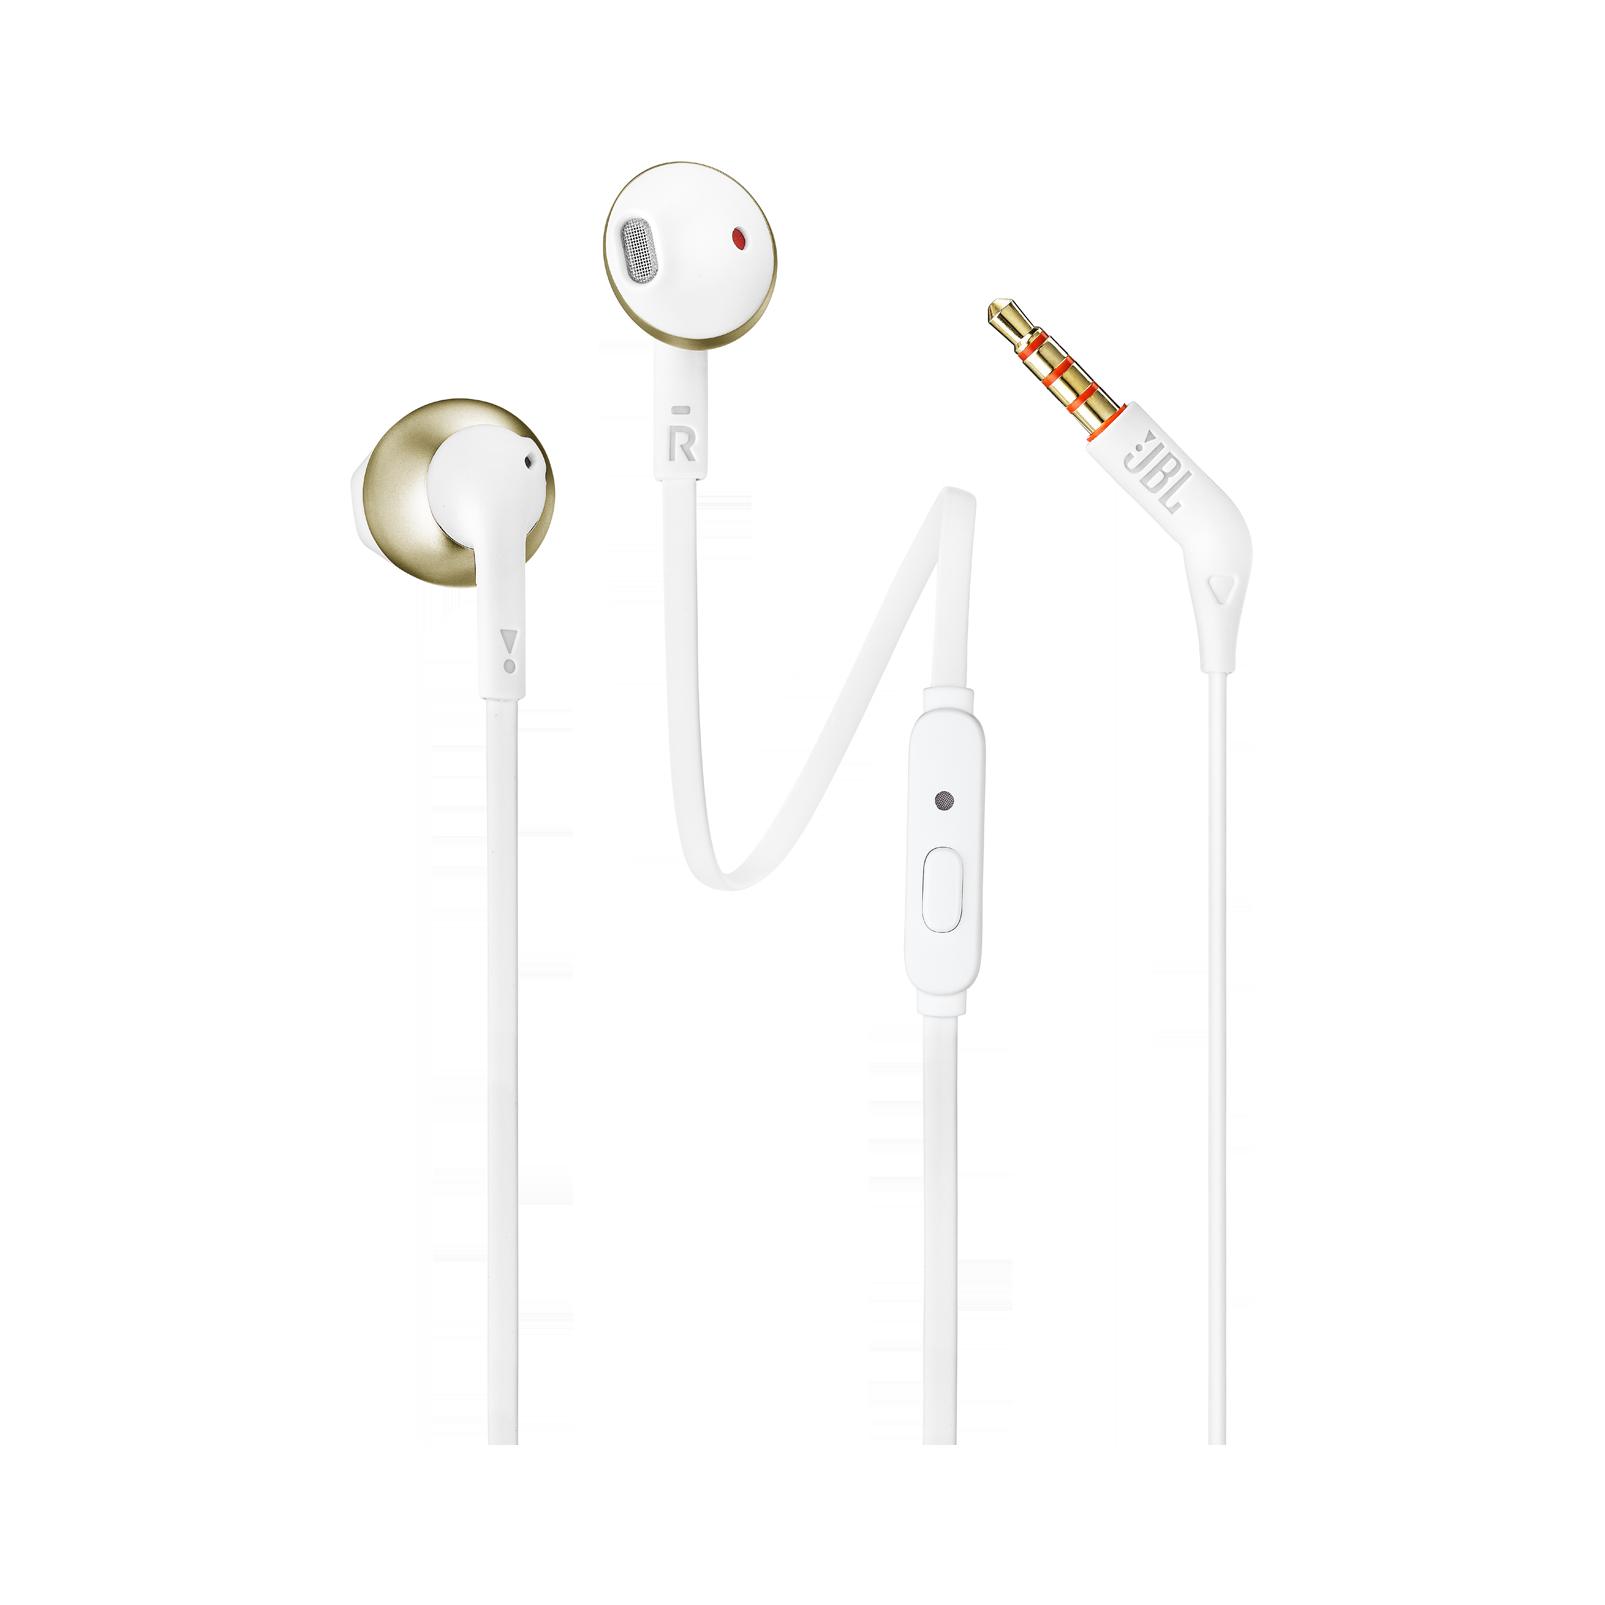 JBL TUNE 205 - Champagne Gold - Earbud headphones - Hero